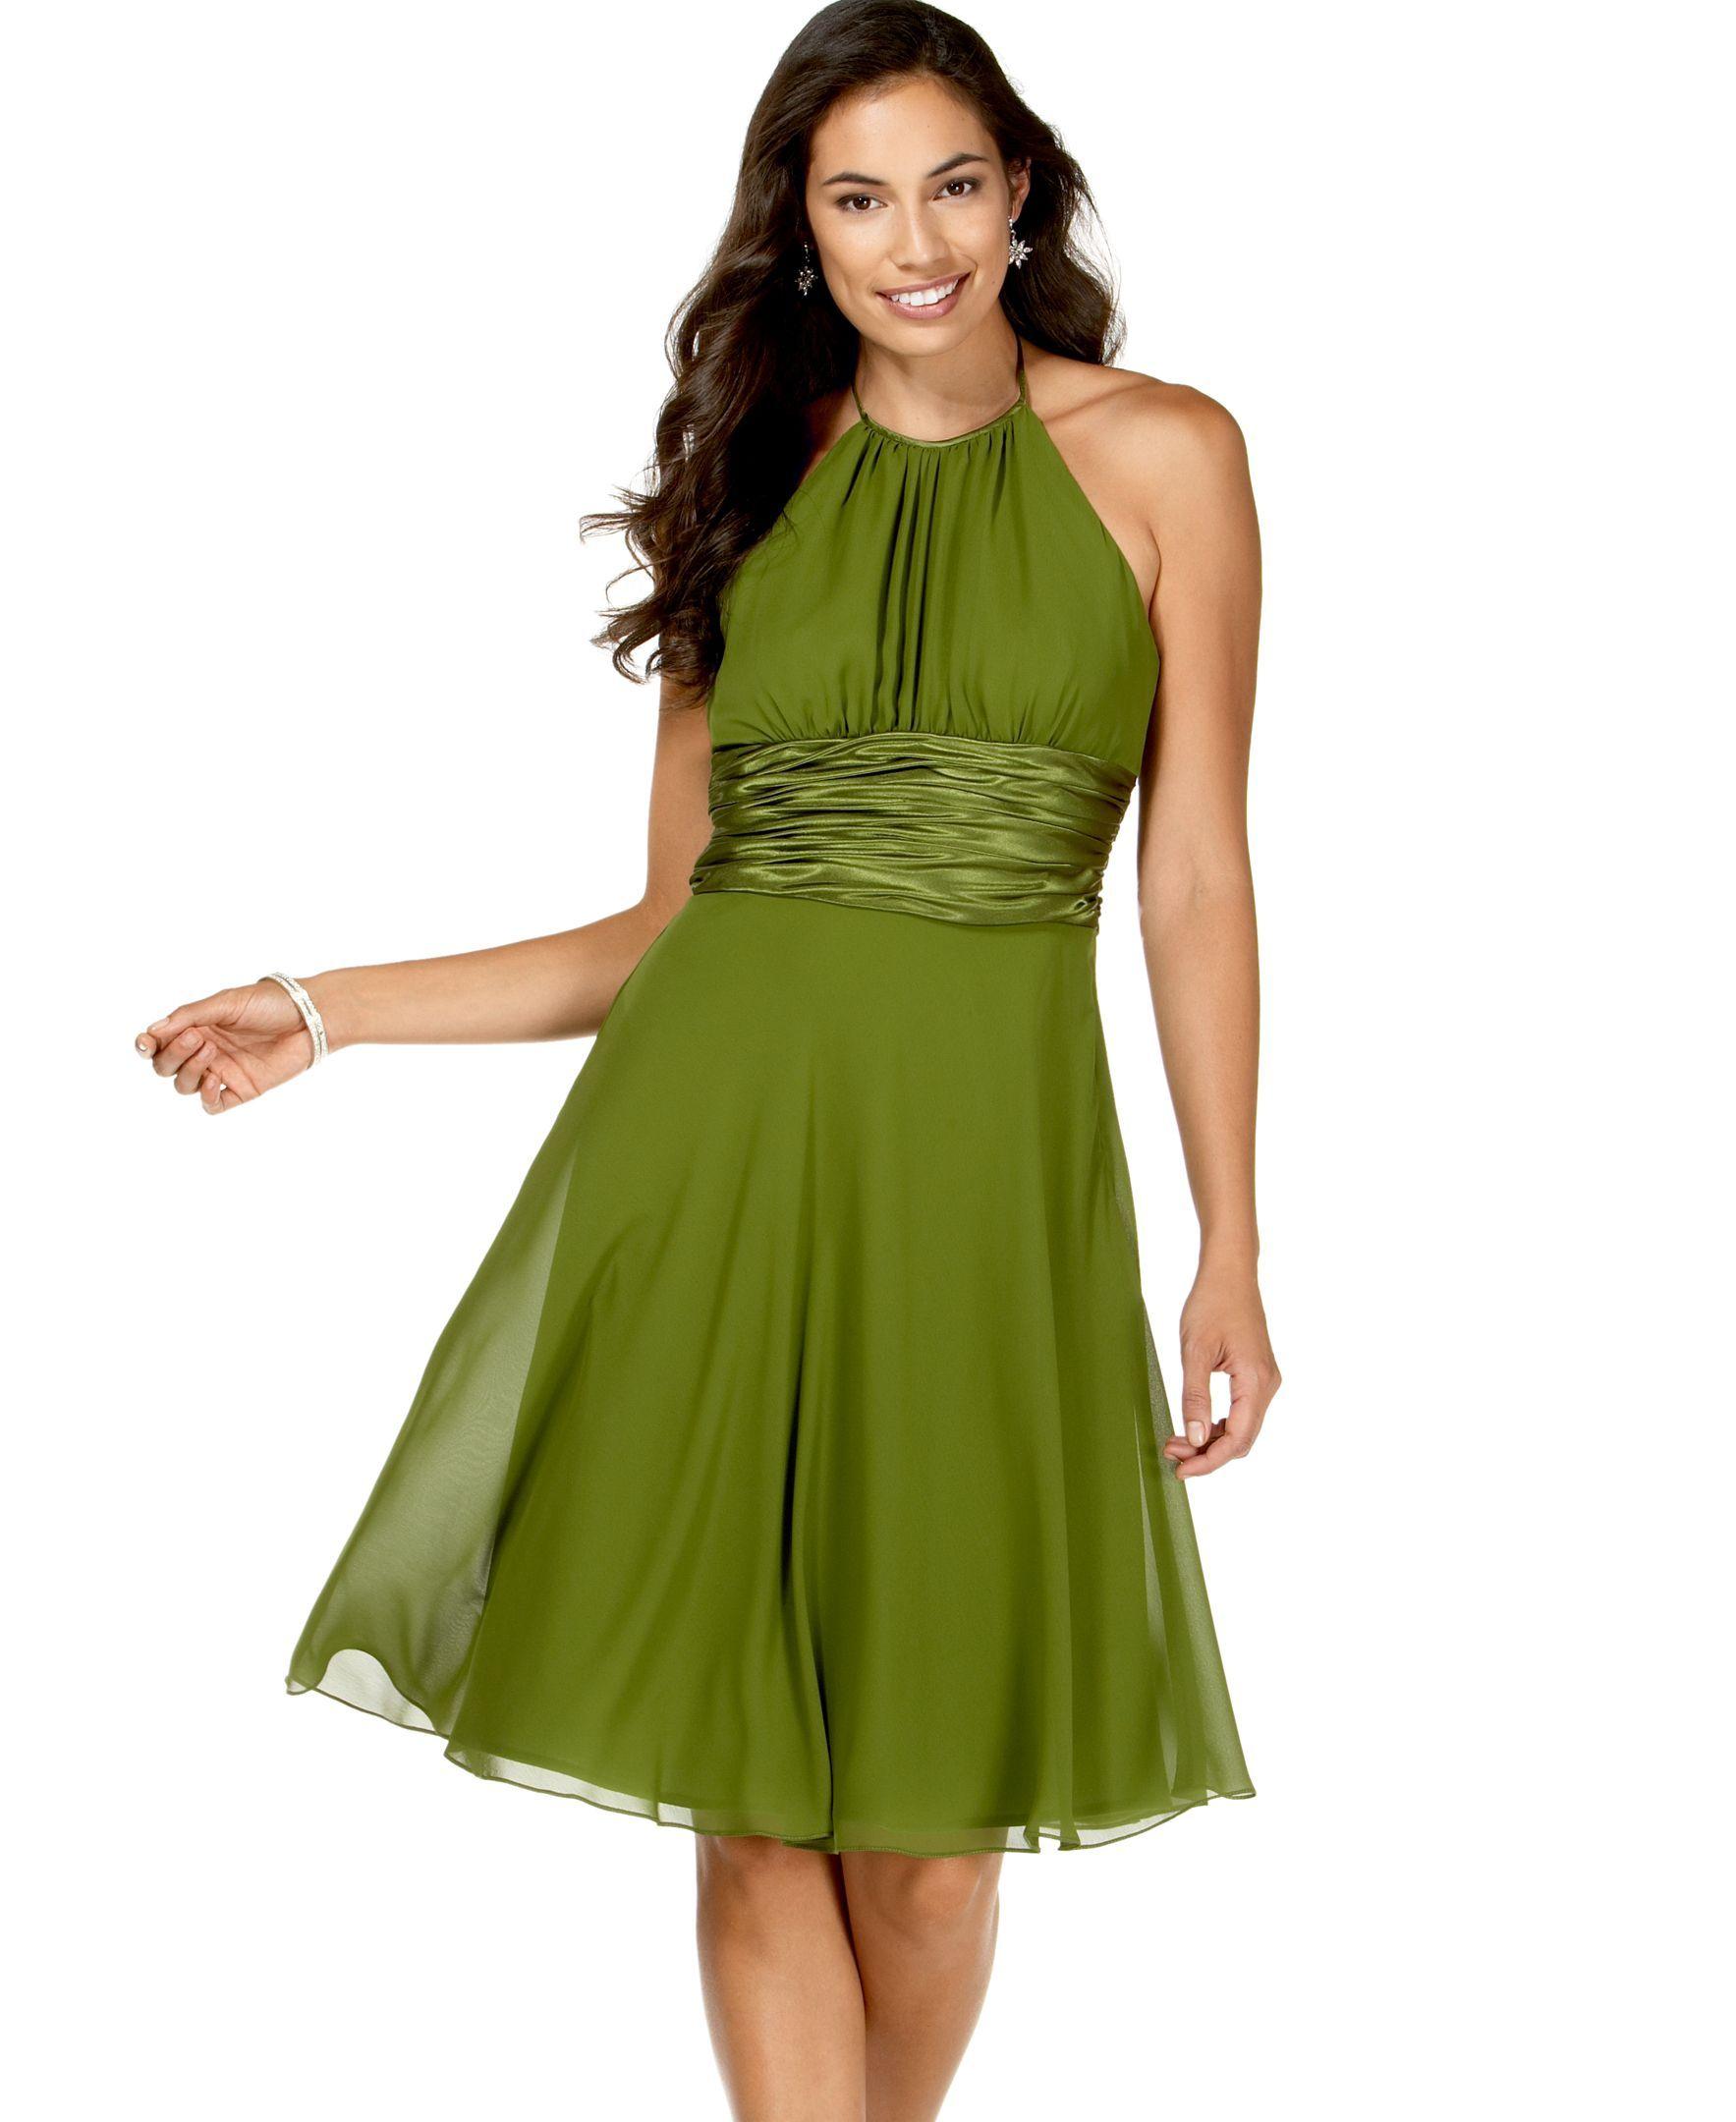 Macys dress 338921_fpx florentina kuhl